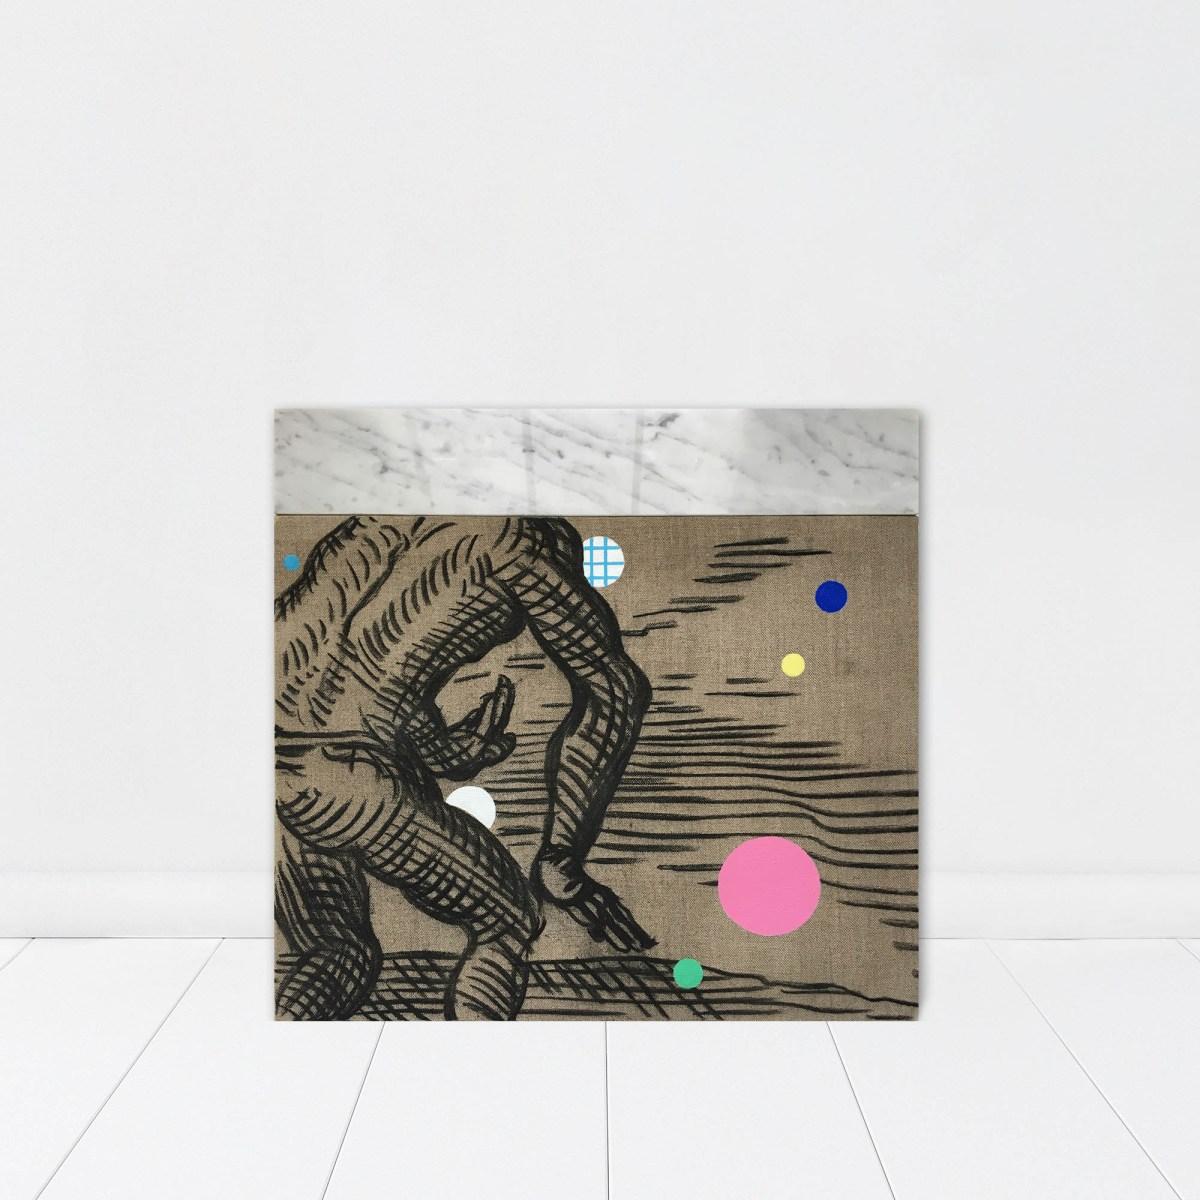 Obra Movimiento de Alejandro Pintado